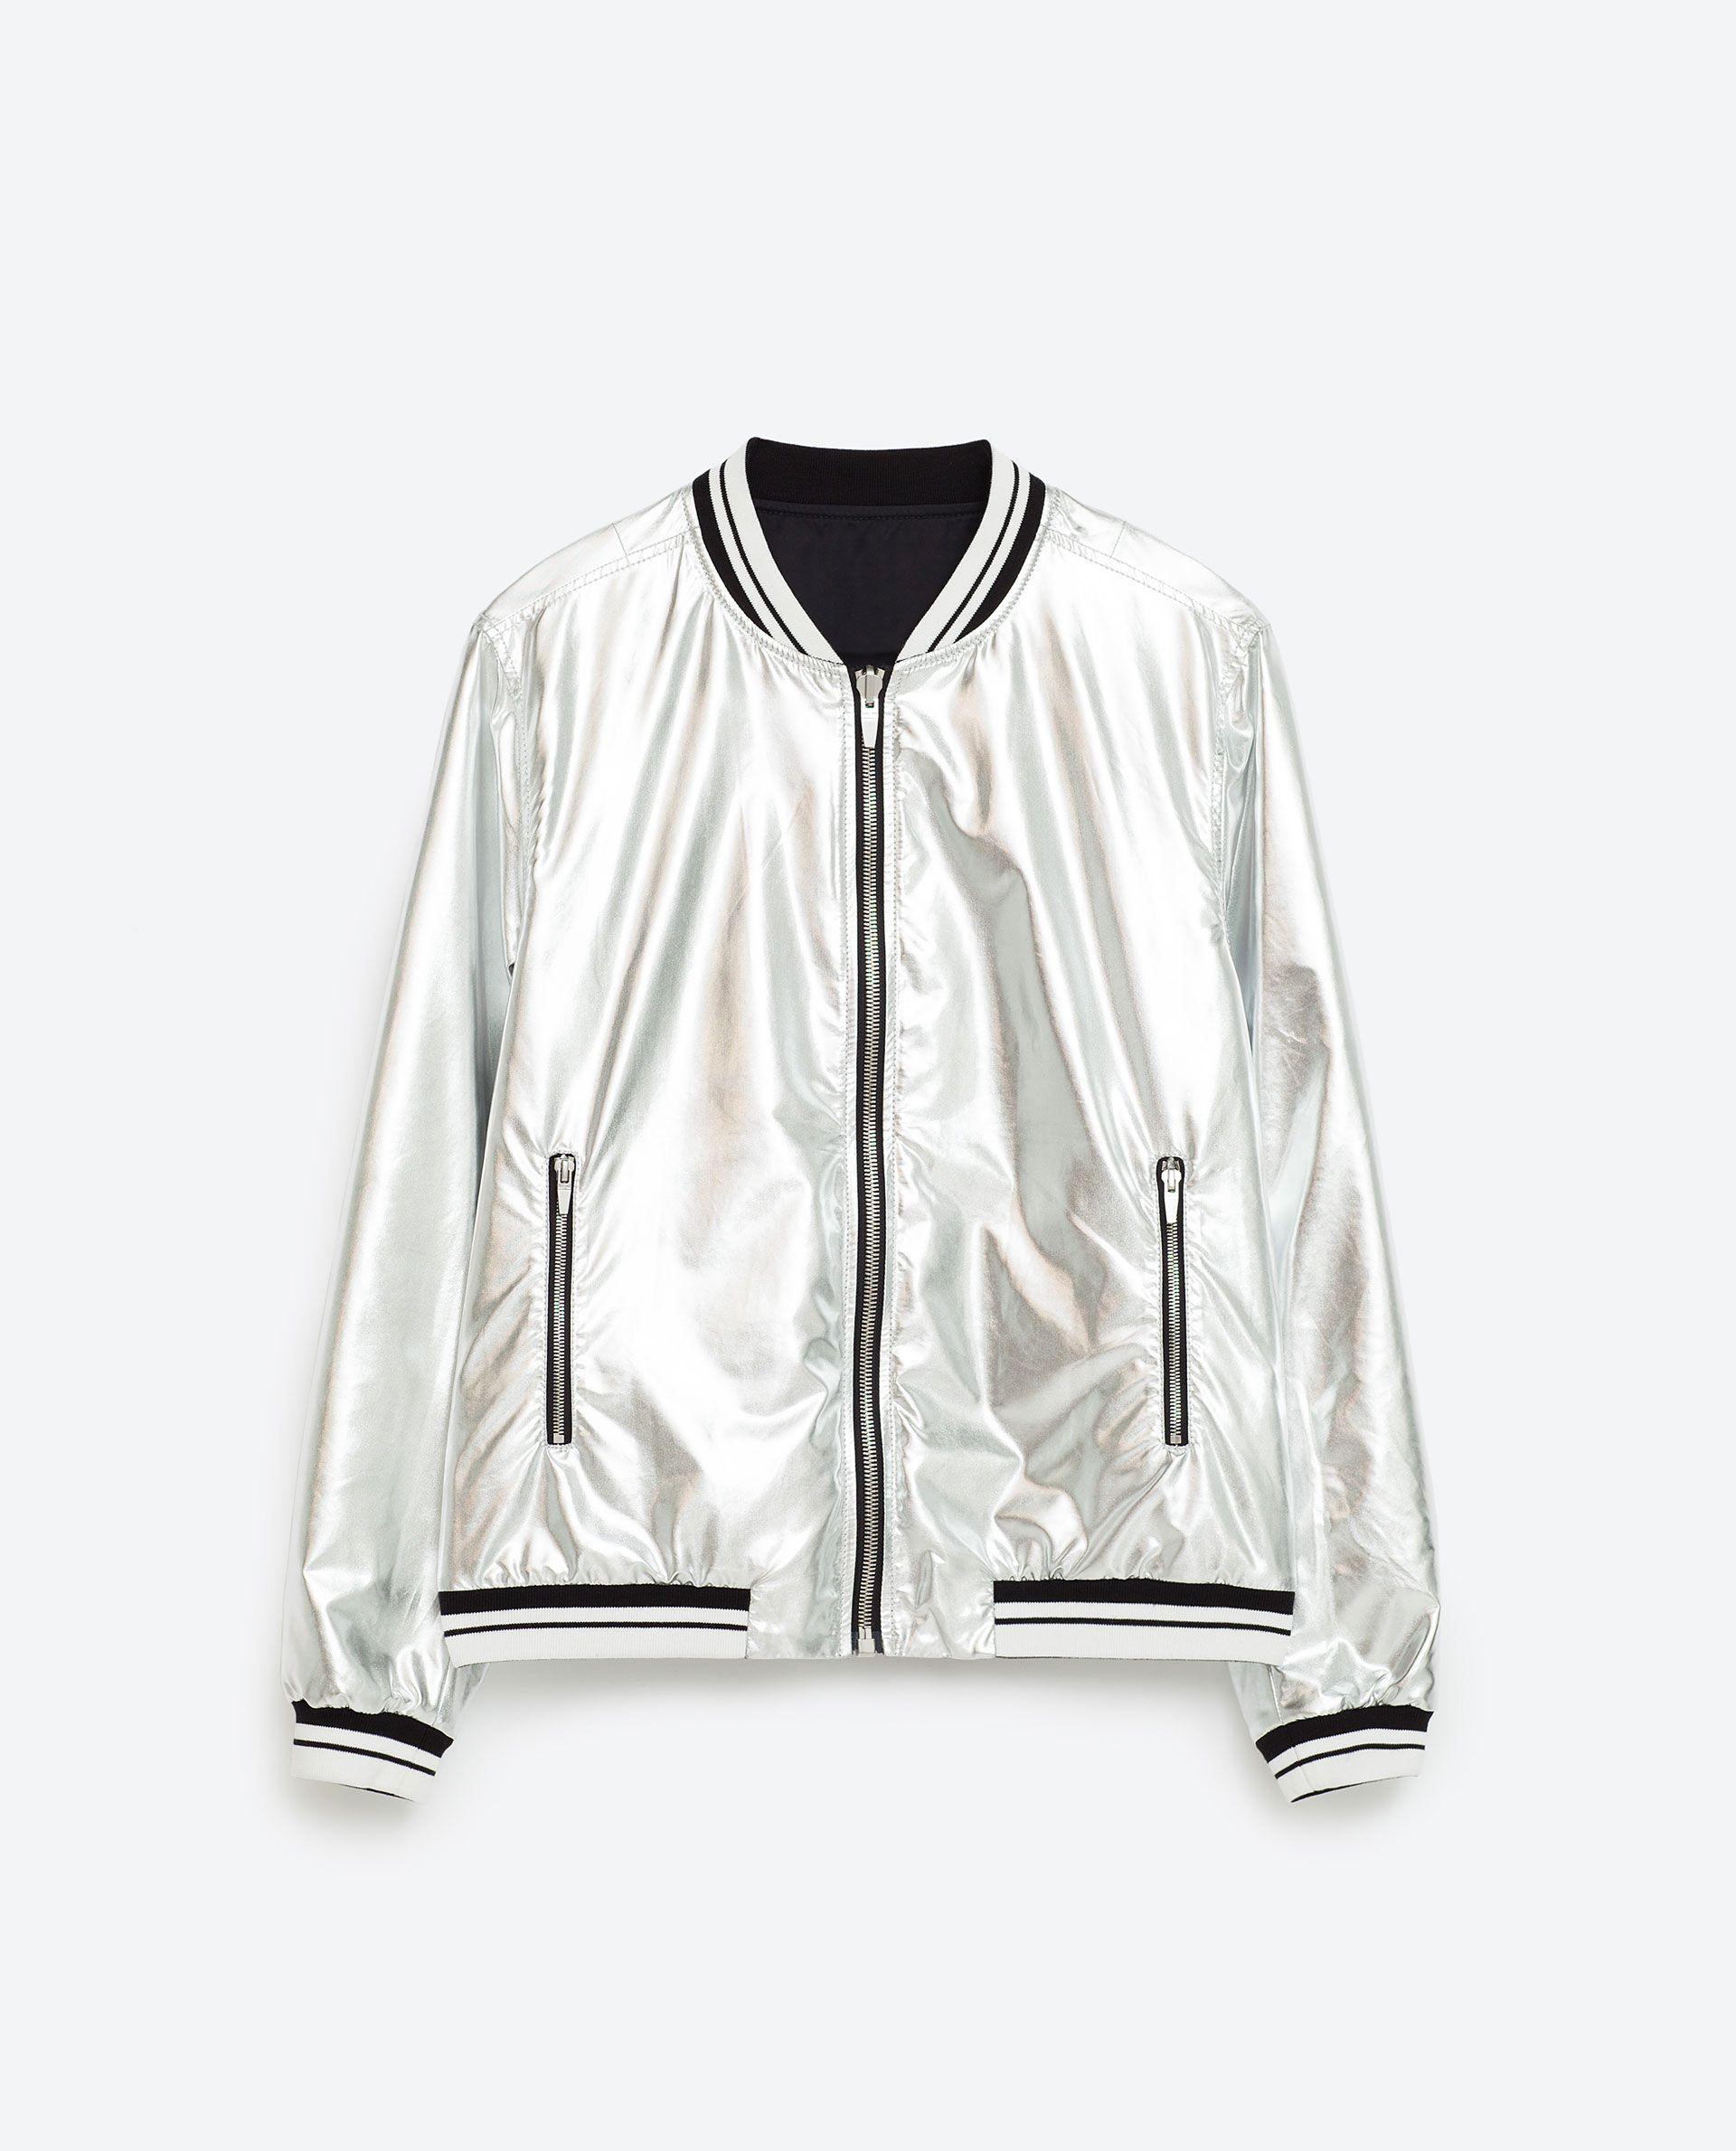 bb8b27ad42c2 Zara Reversible silver bomber jacket. Zipped flap pockets. Detail on the  sleeves  99.90.